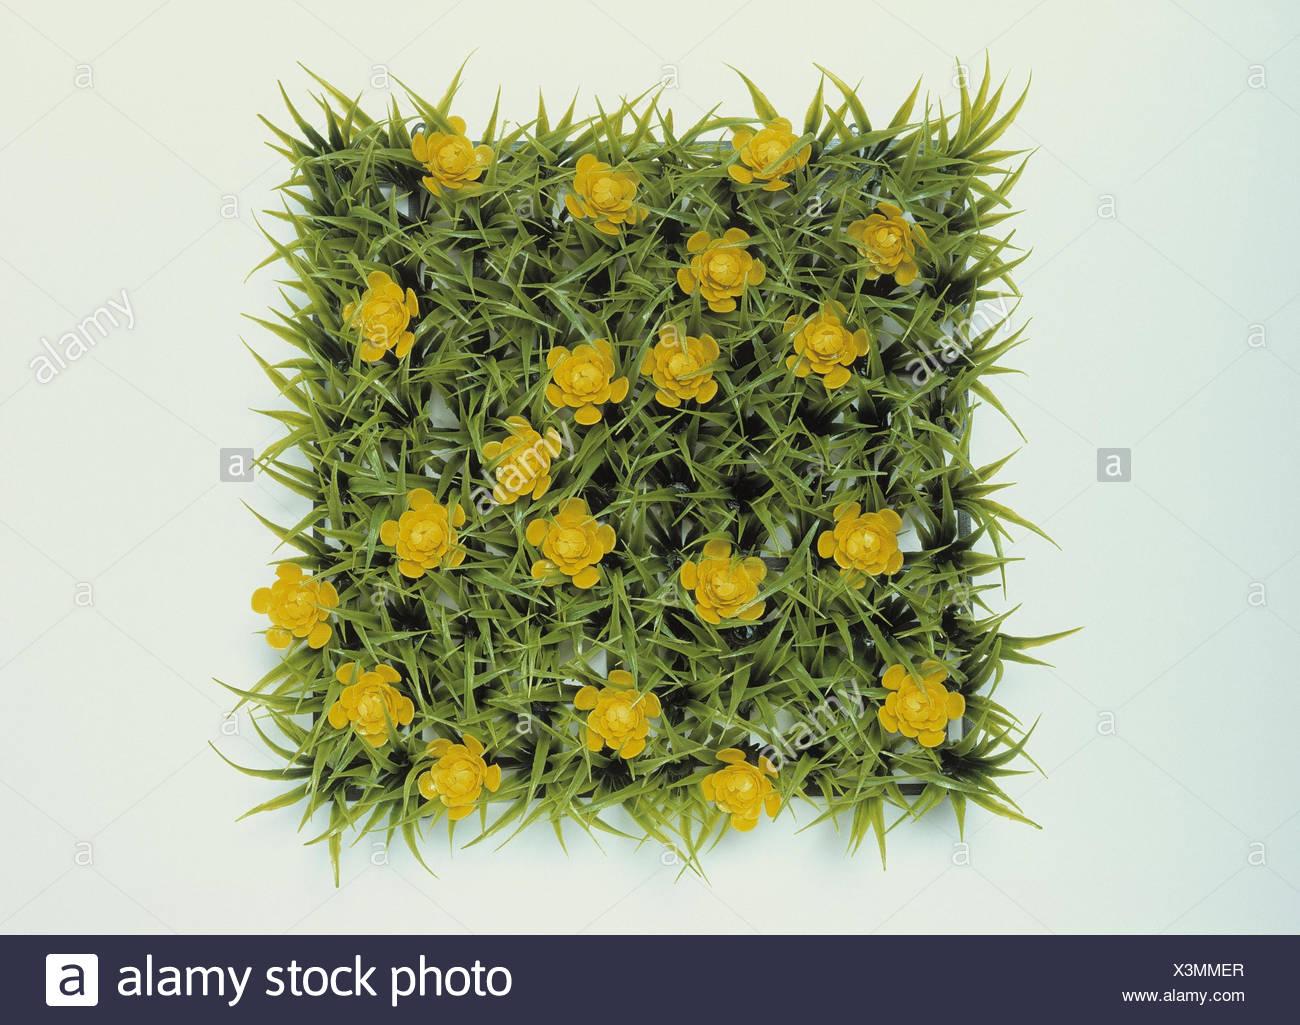 Art turfs, blossoms, yellow turf, meadow, artificially, flowers, flower heads, adornment, Deko, decoration, Dekorasen, Dekoblumen, decoration object, product photography, Still life, cut out - Stock Image